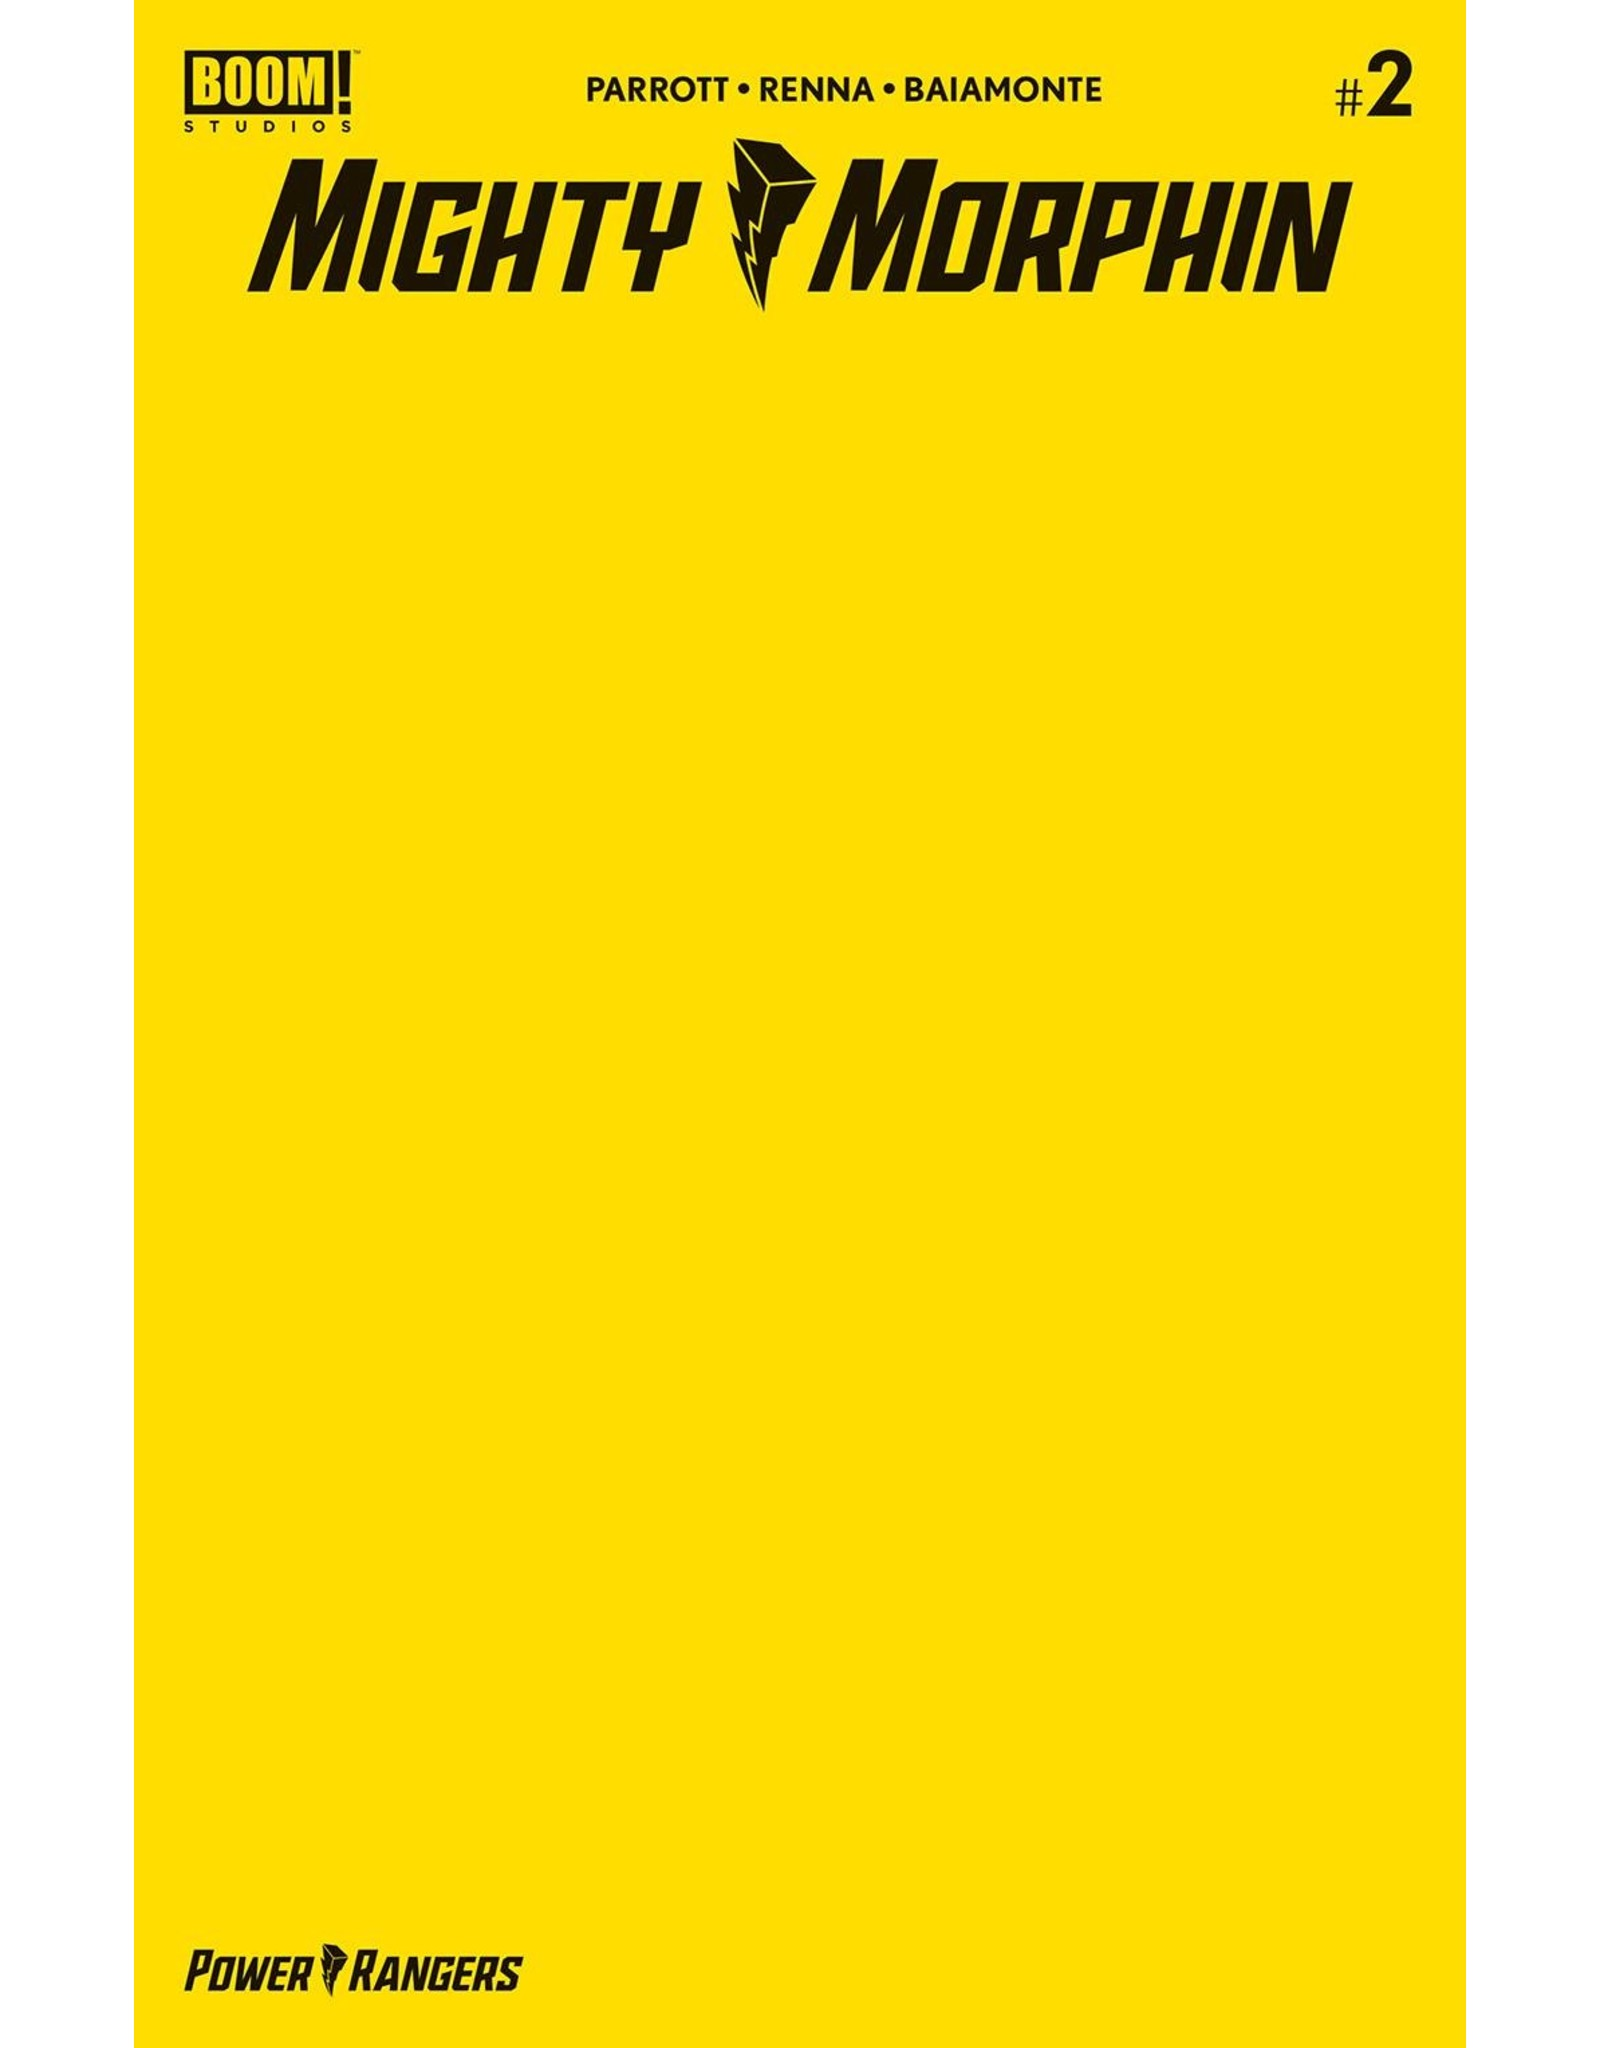 BOOM! STUDIOS MIGHTY MORPHIN #2 CVR C YELLOW BLANK SKETCH